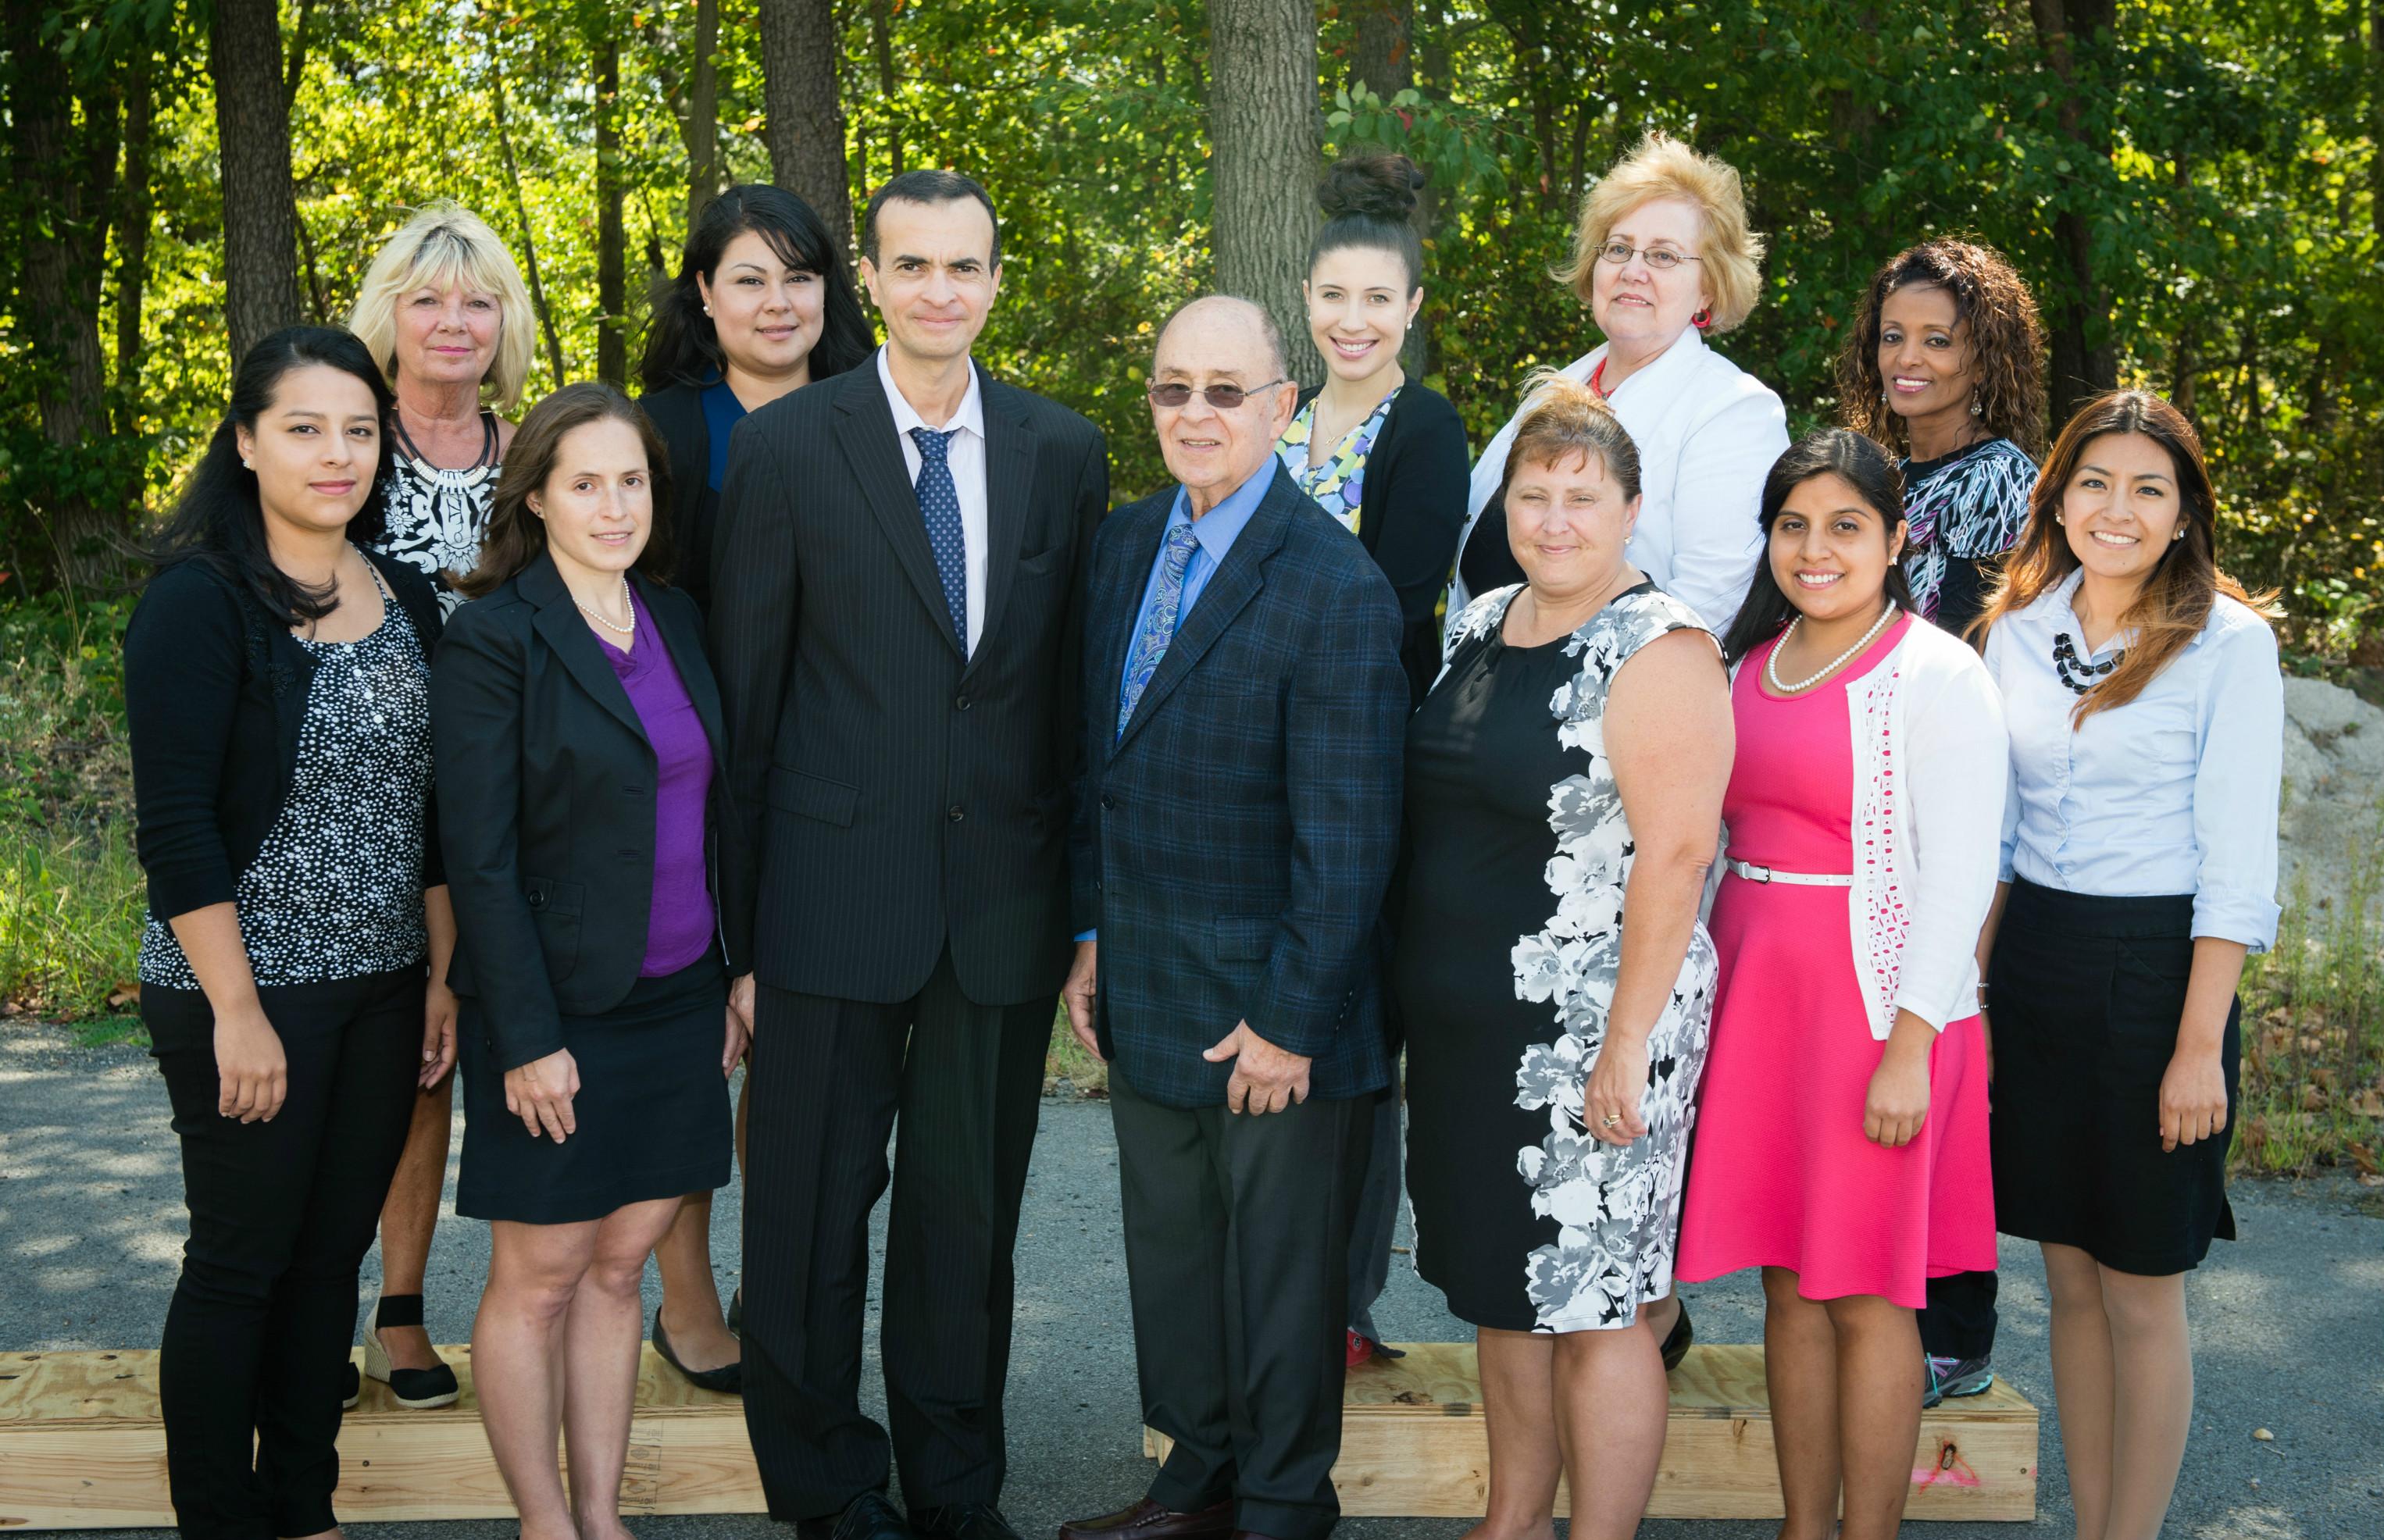 Dr. Koslow and Associates, LTD